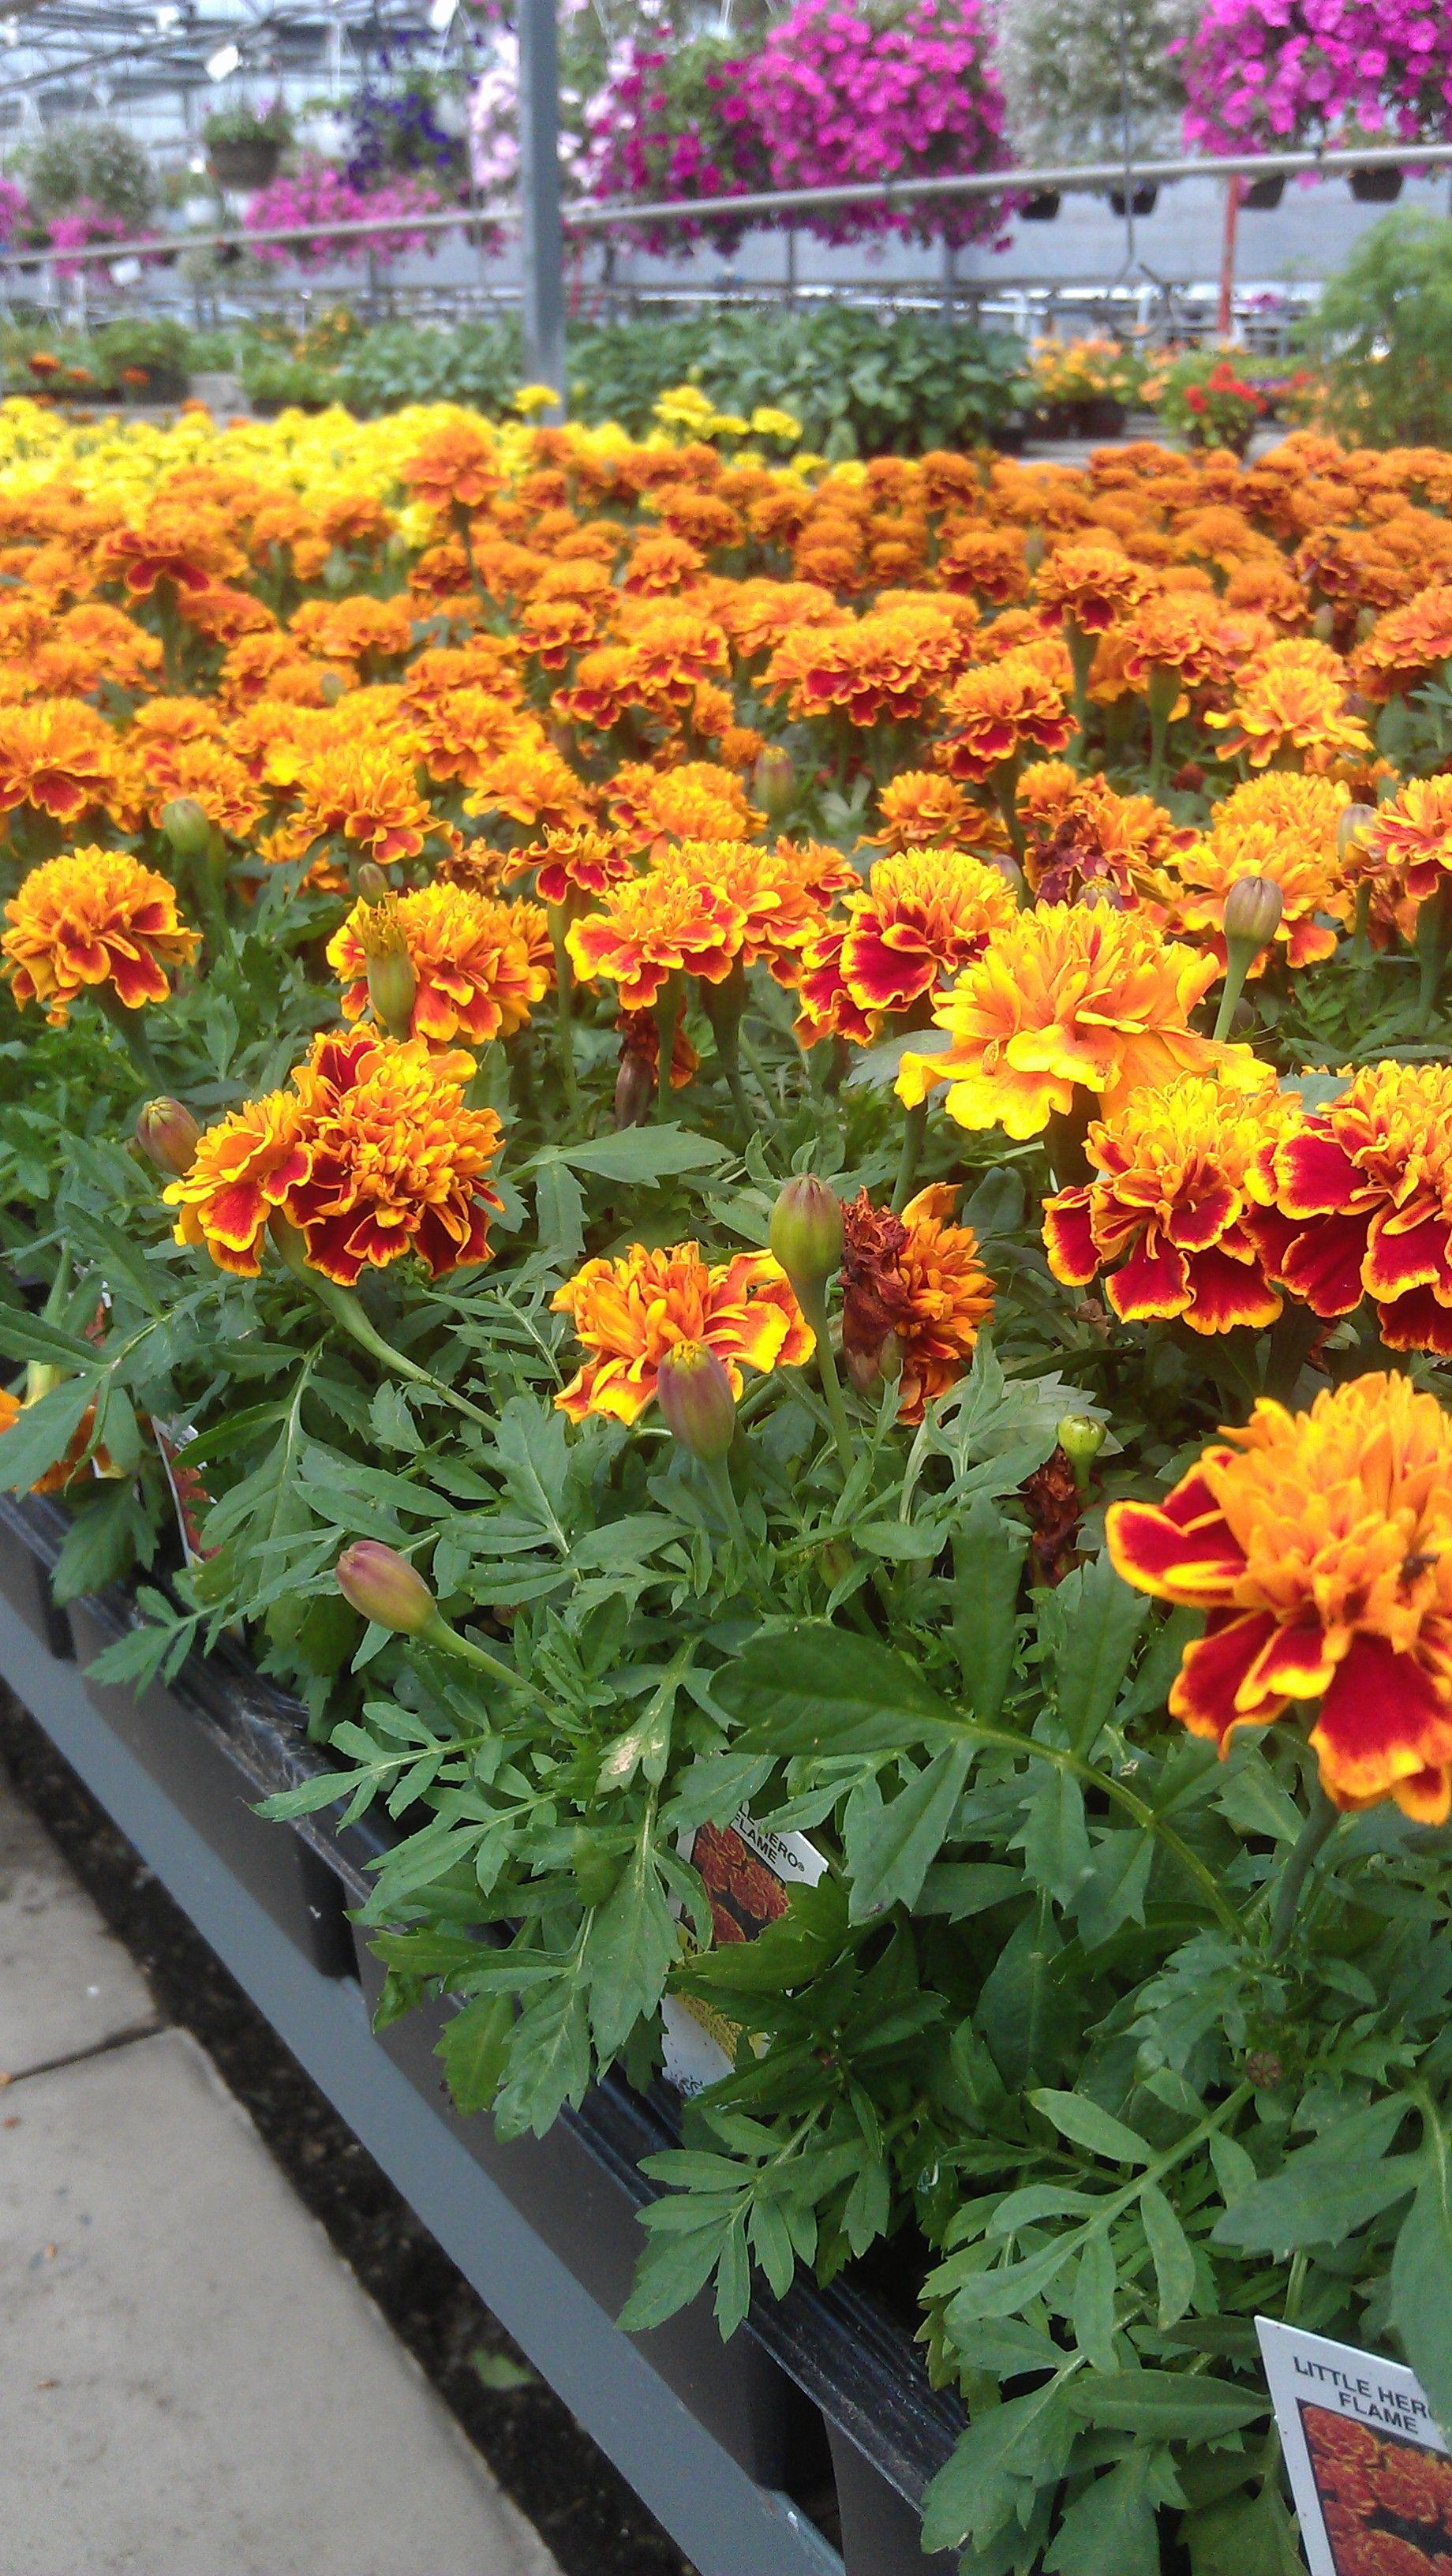 Marigolds.Add These Throughout Veggie Gardens To Help